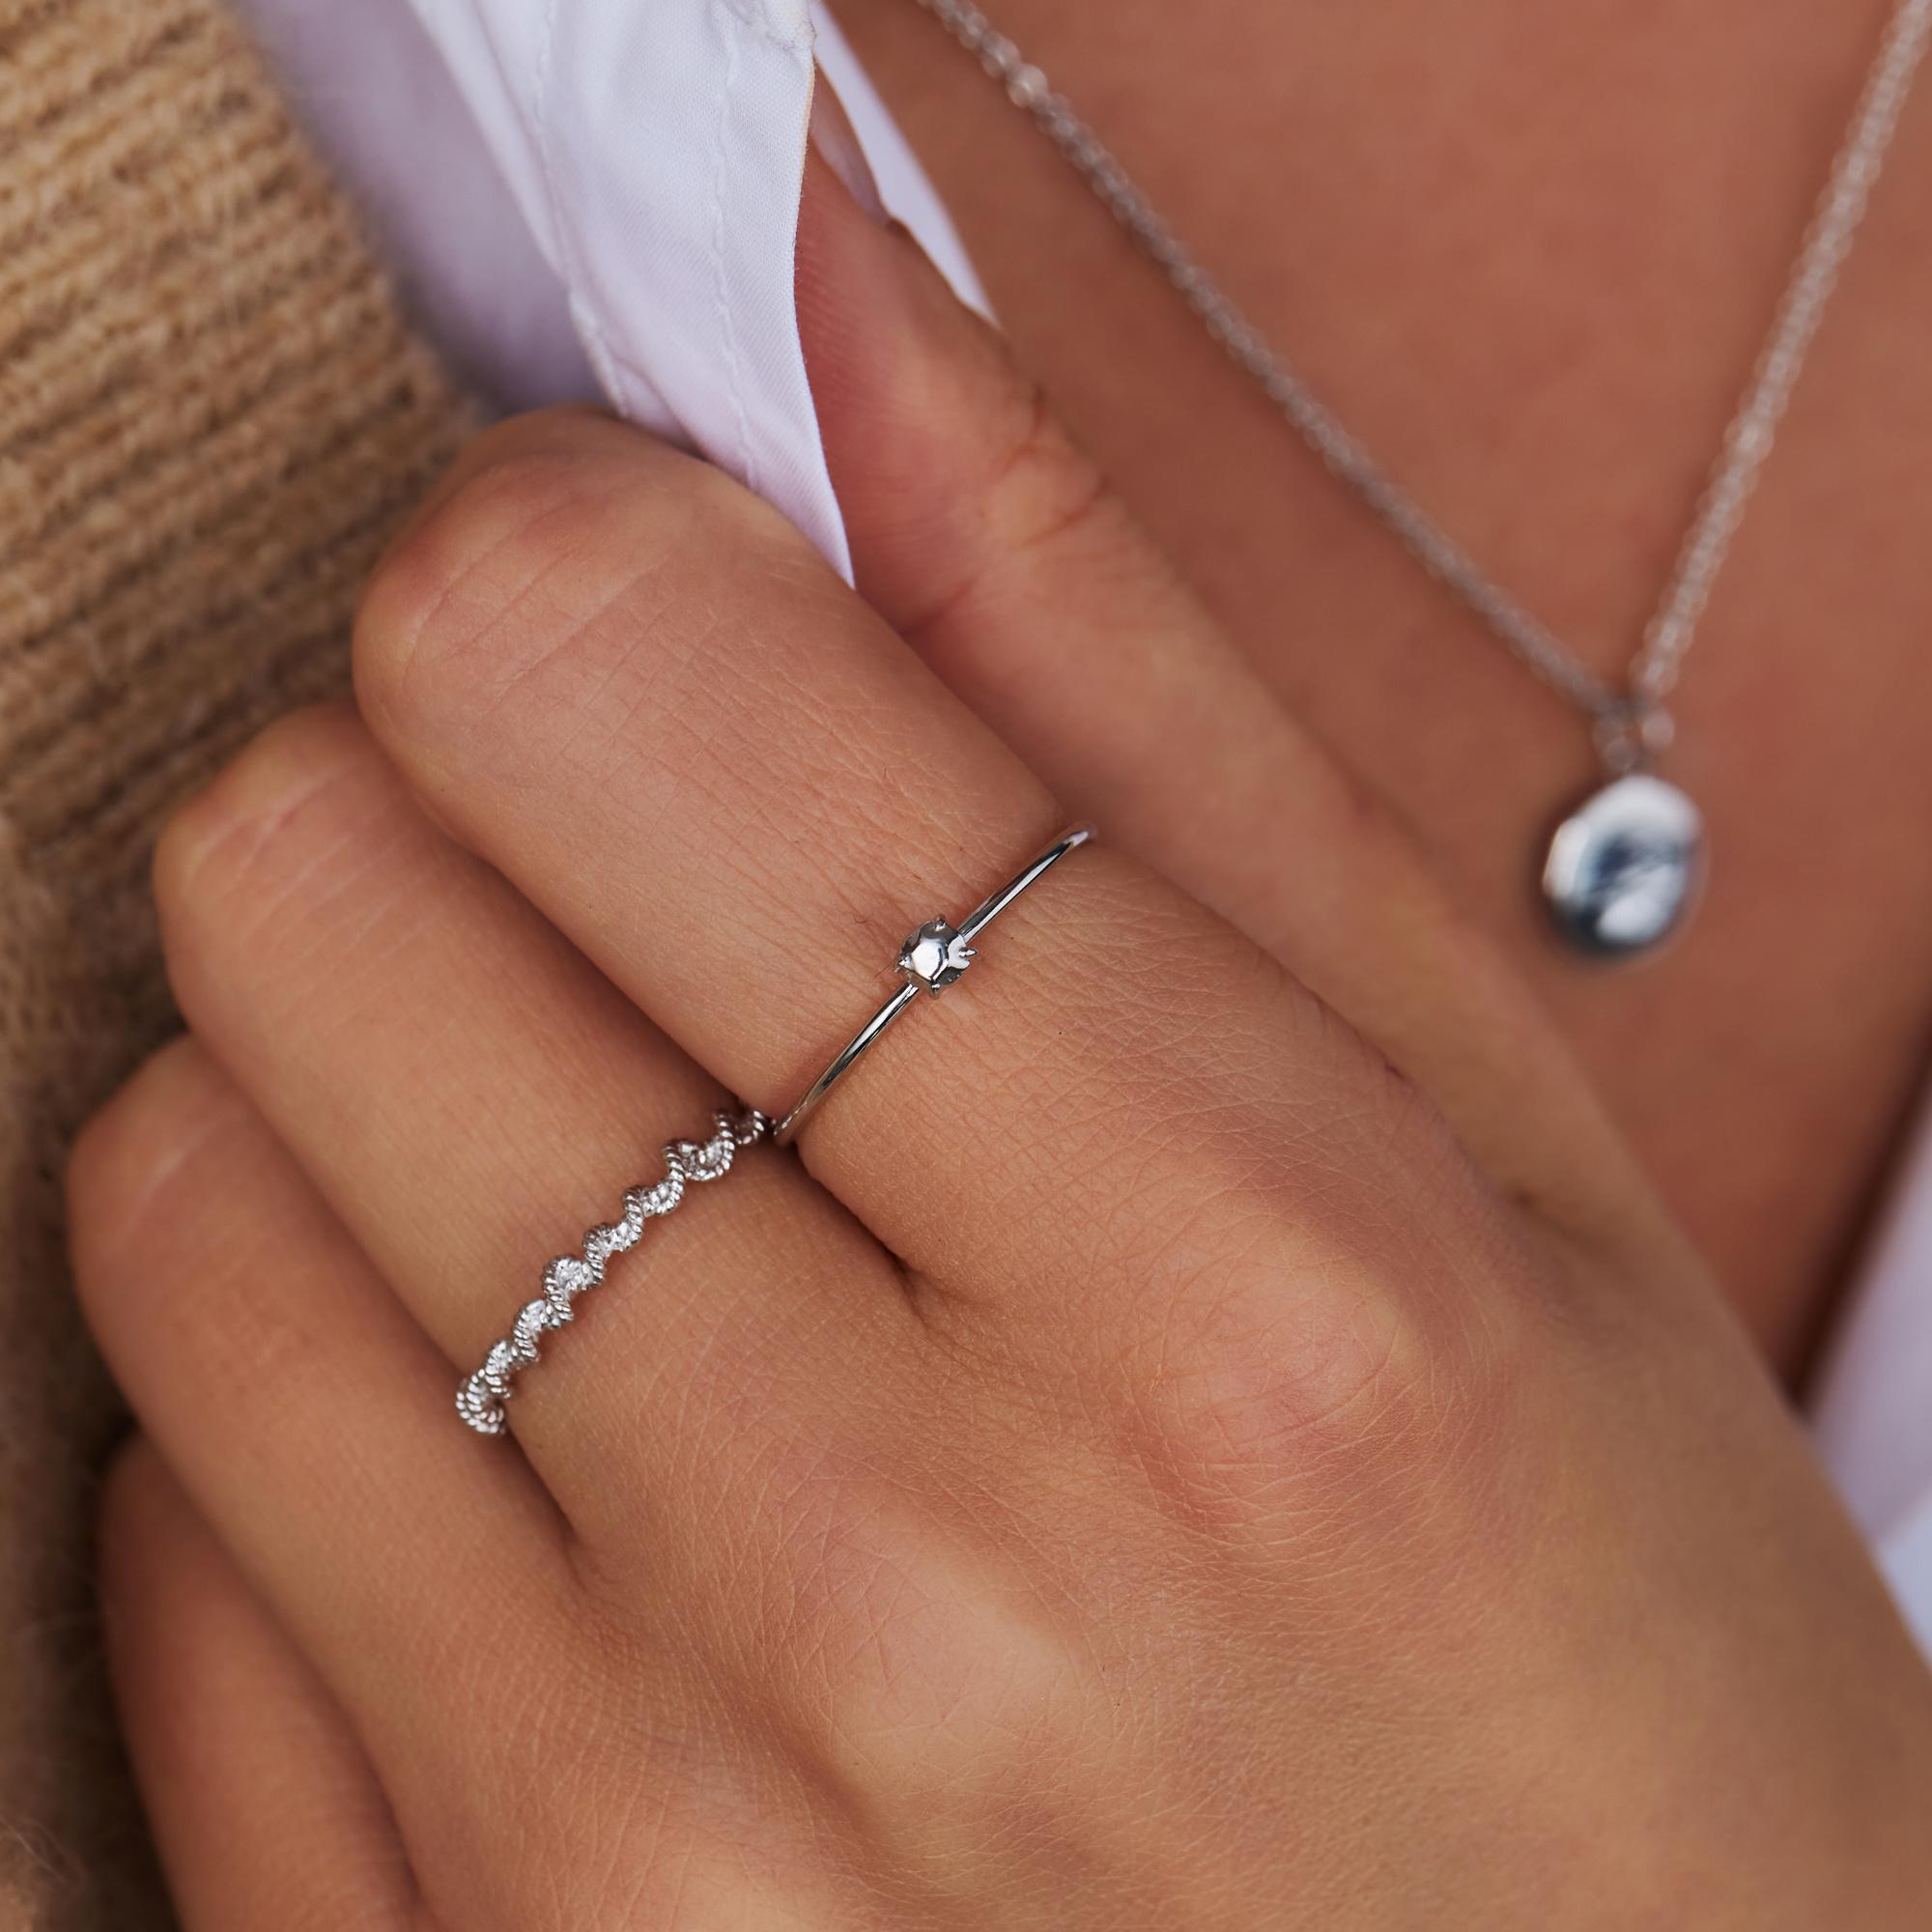 Violet Hamden Sisterhood Lunar anello in argento sterling 925